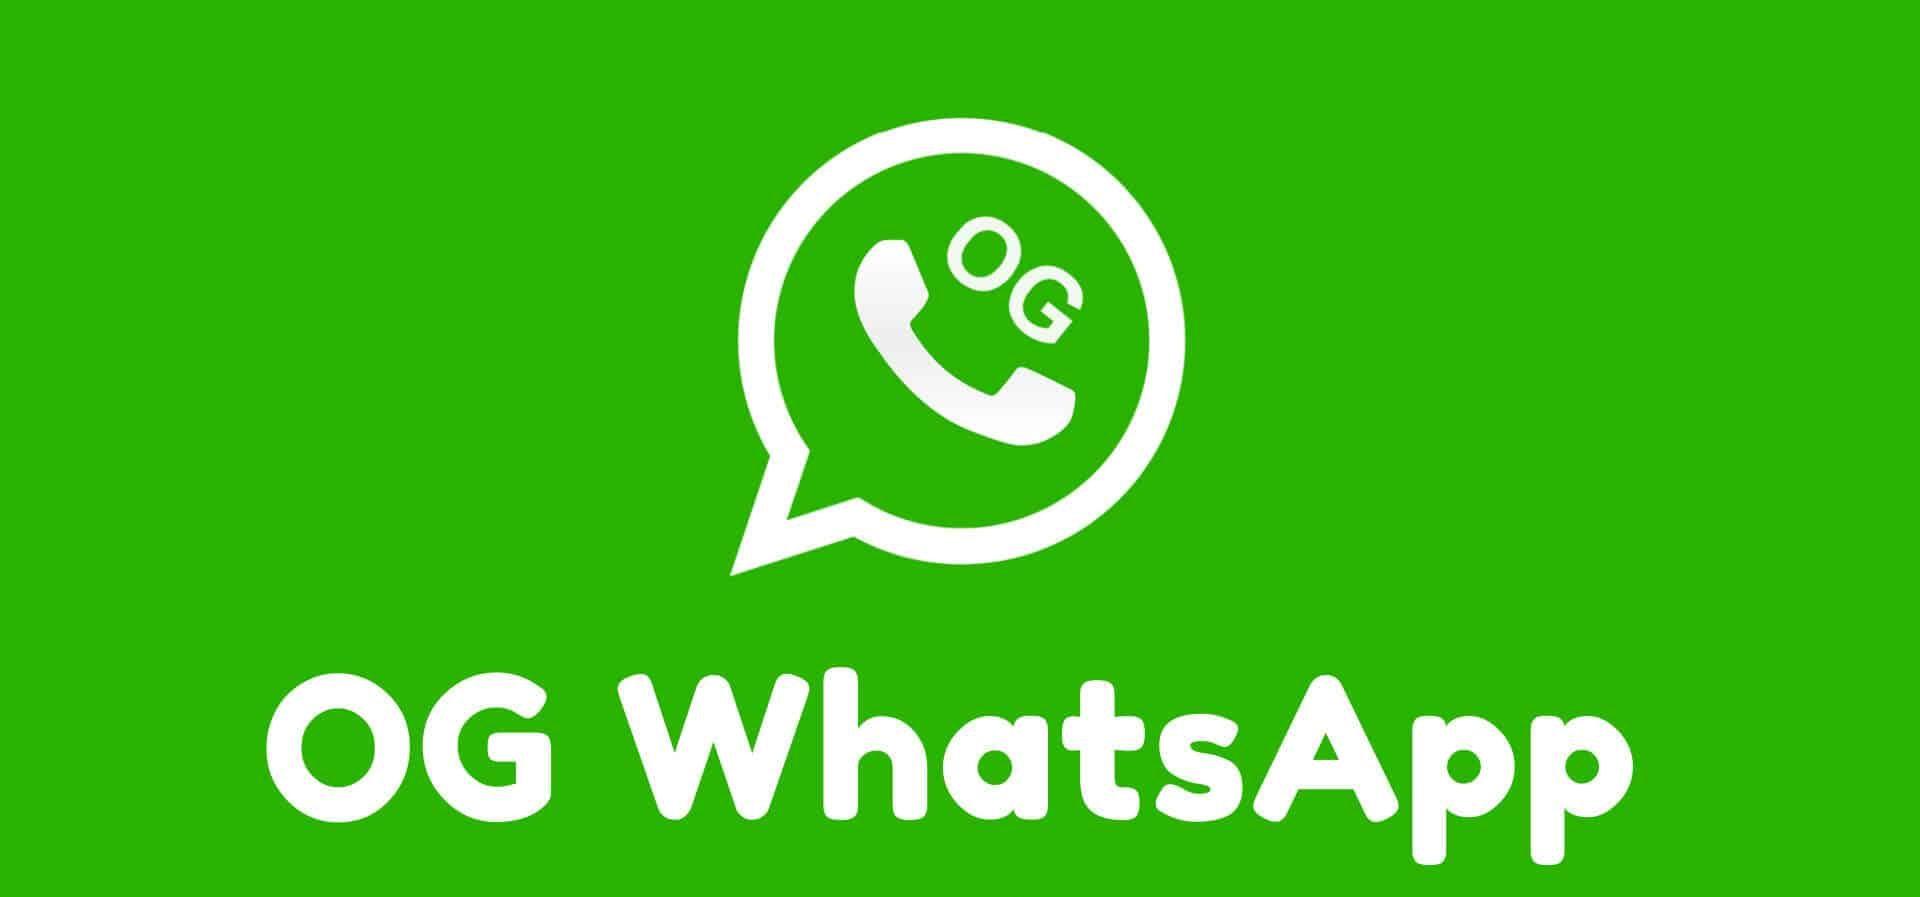 OGWhatsApp APK Download (Official Latest Version) 2021